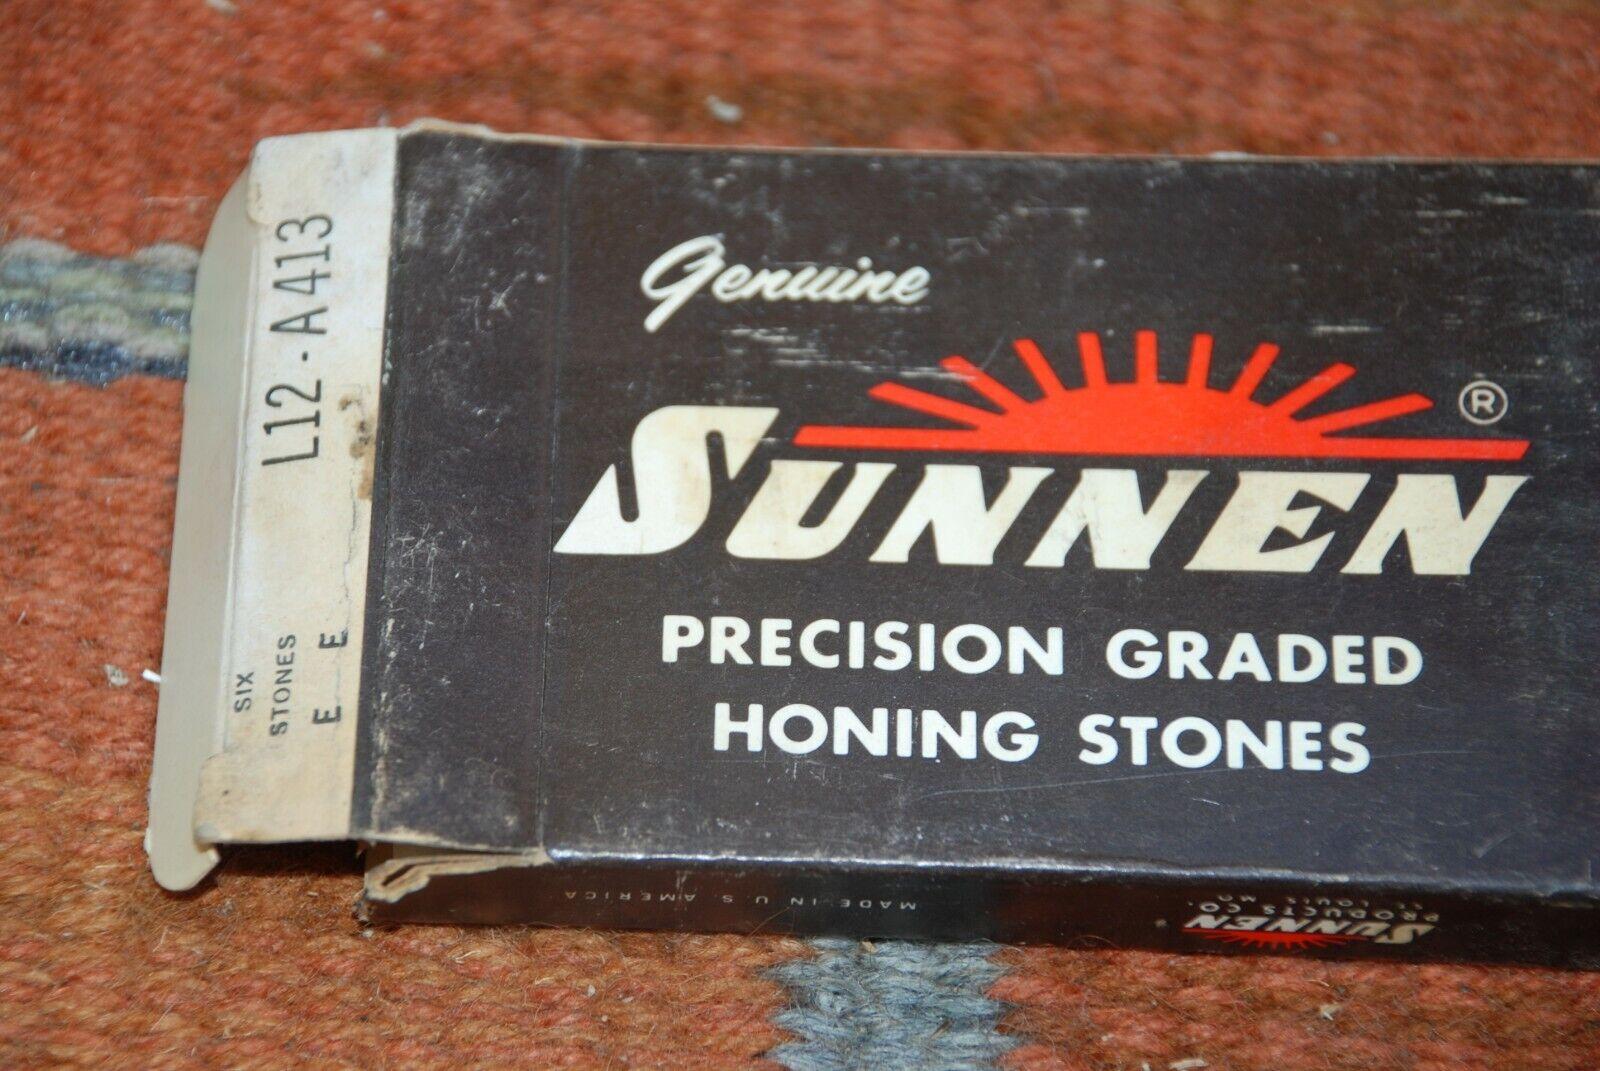 Sunnen Precision Honing Stones L6-A67 Box of 12 New Stones